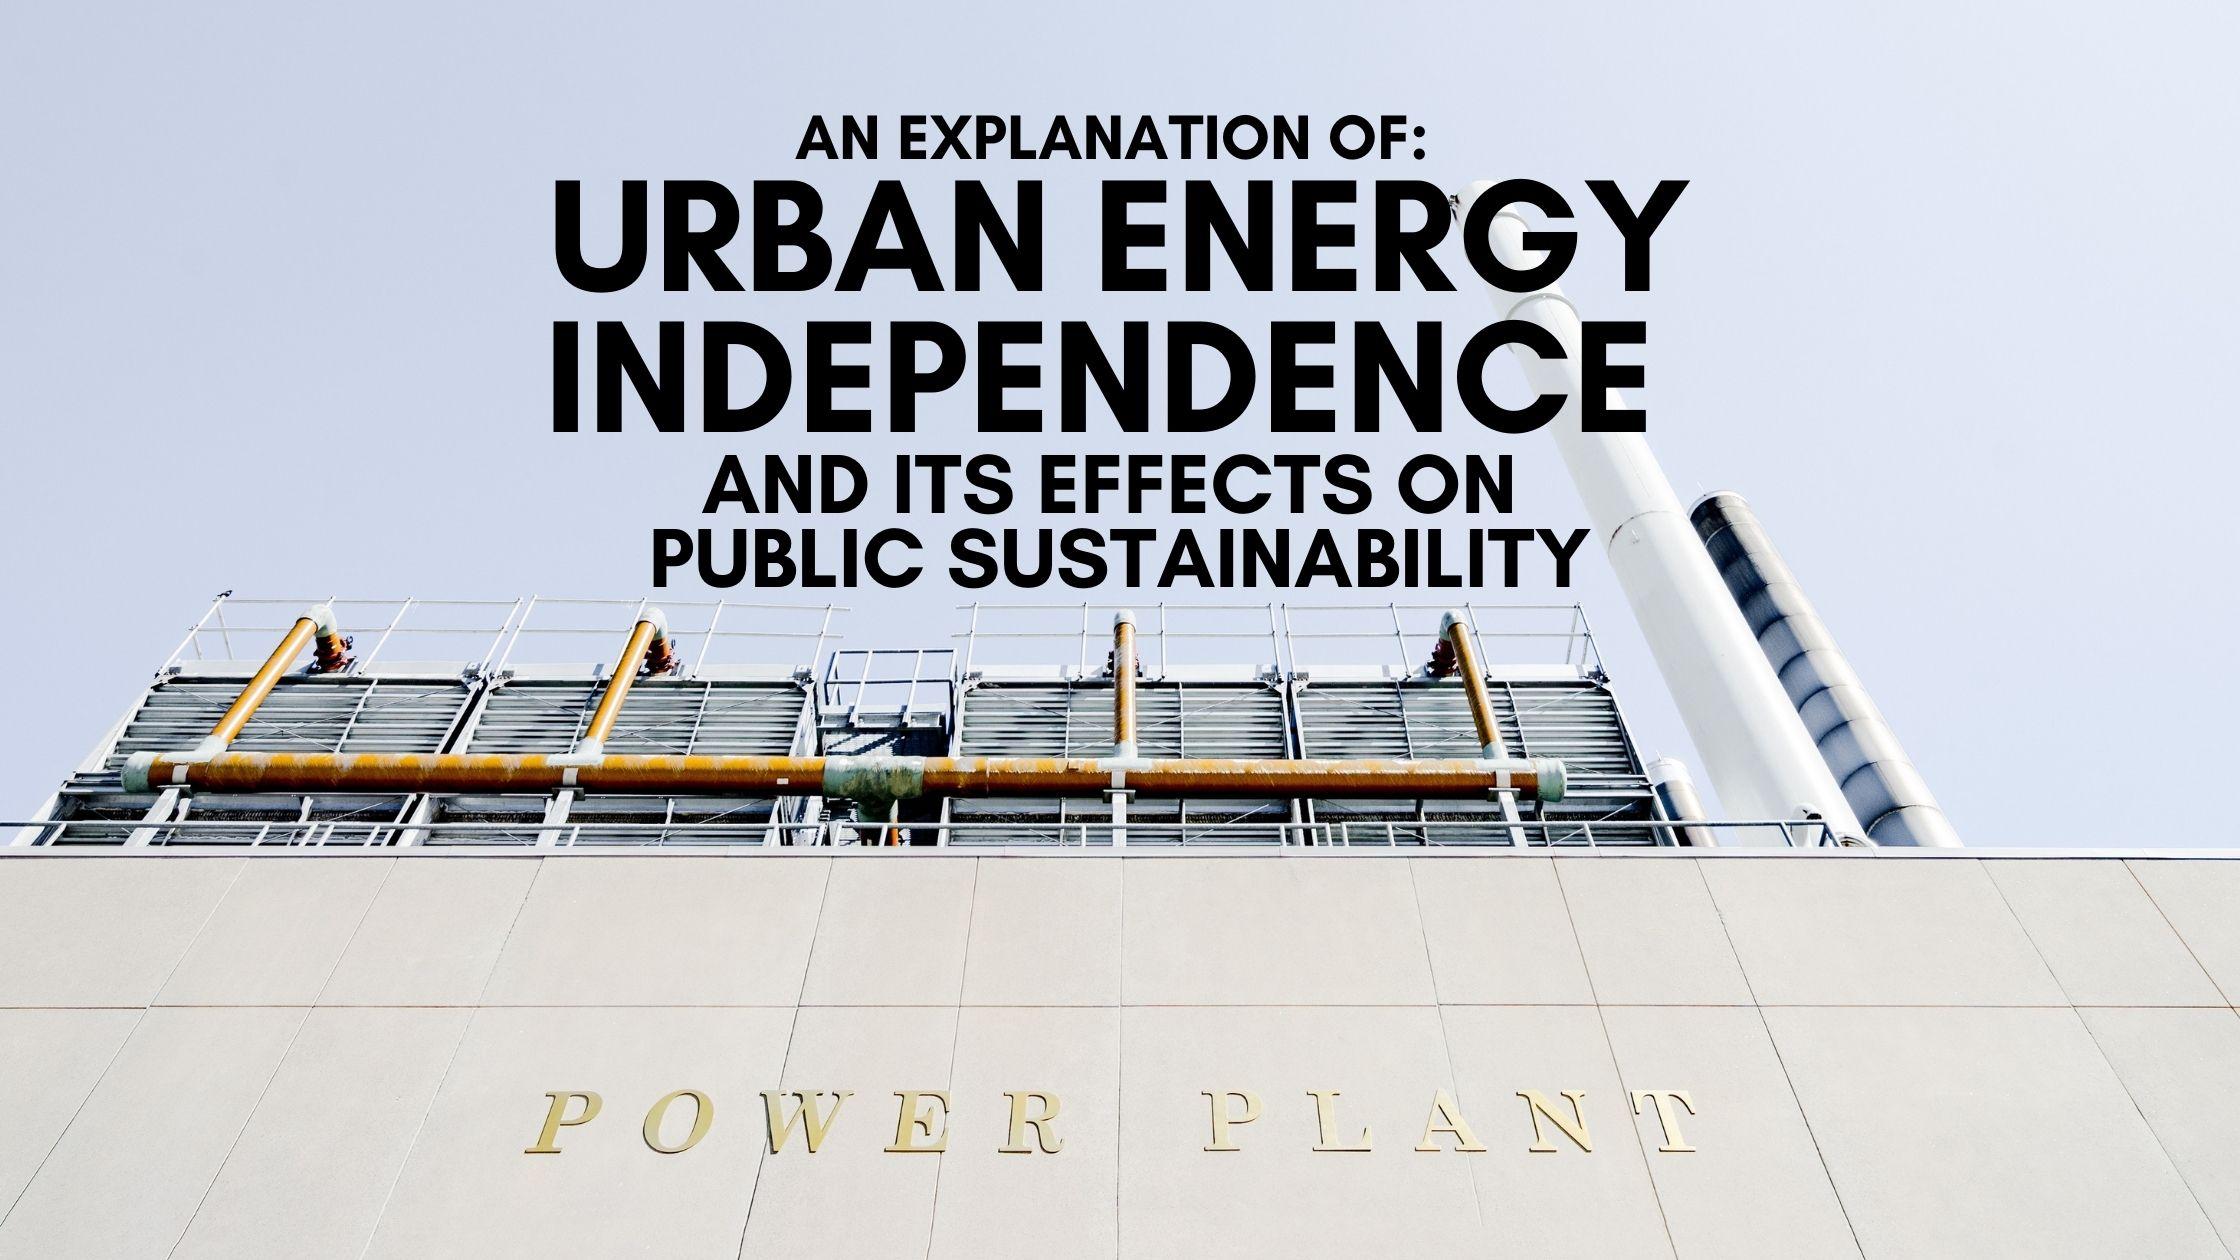 Urban Energy Independence and Public Sustainability